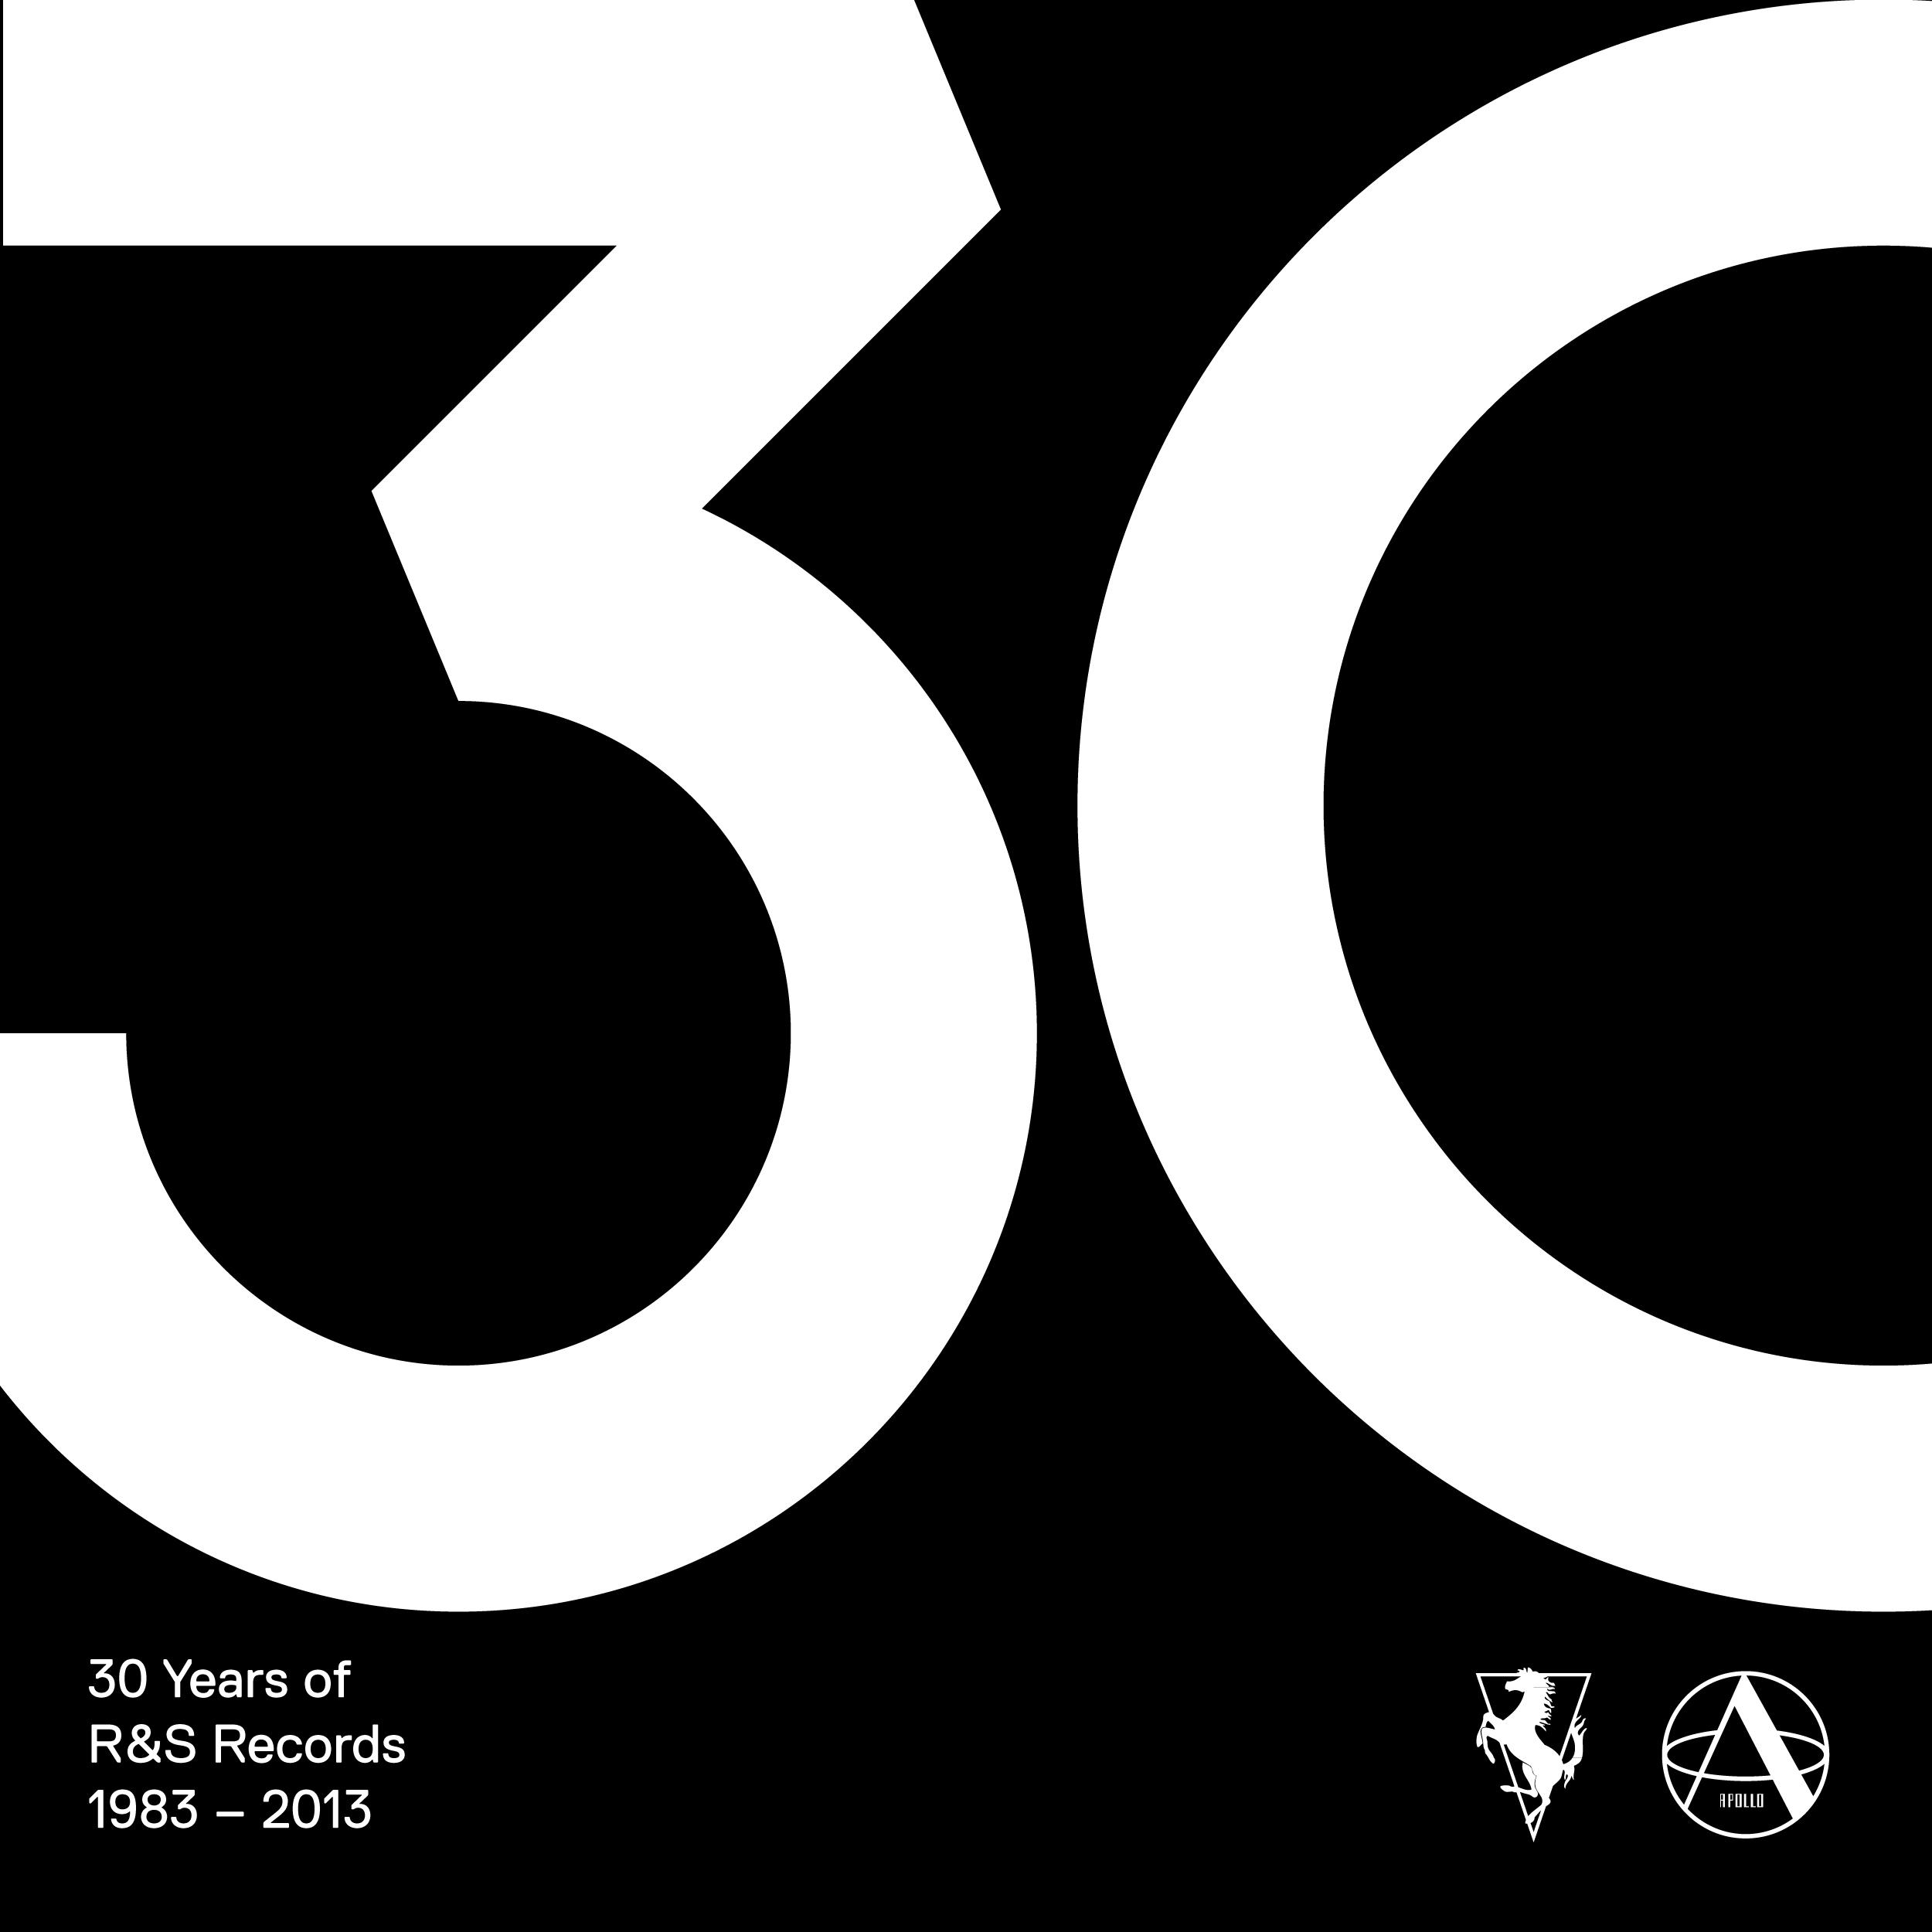 R&S Records feiert 30. Geburtstag